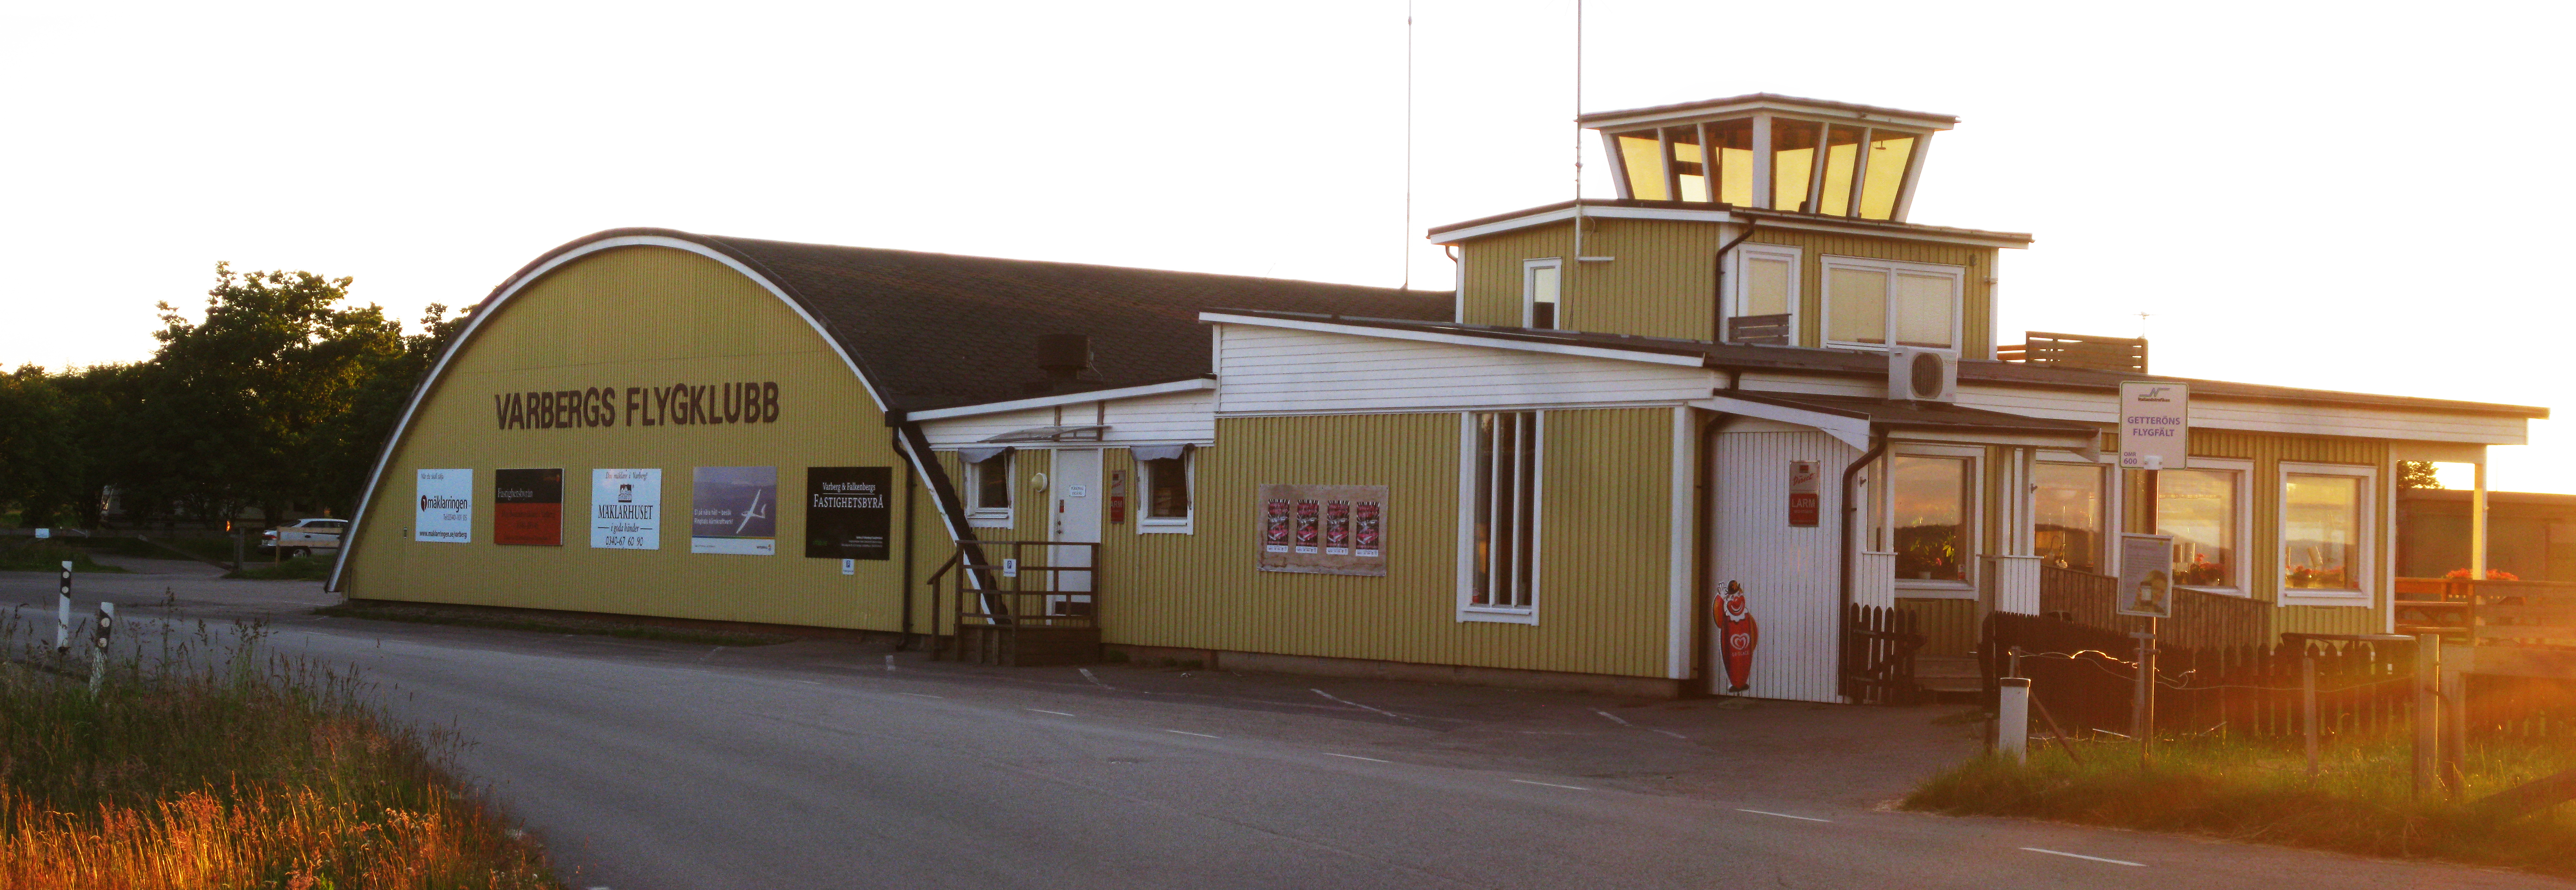 File Varbergs Flygplats 01 Jpg Wikimedia Commons